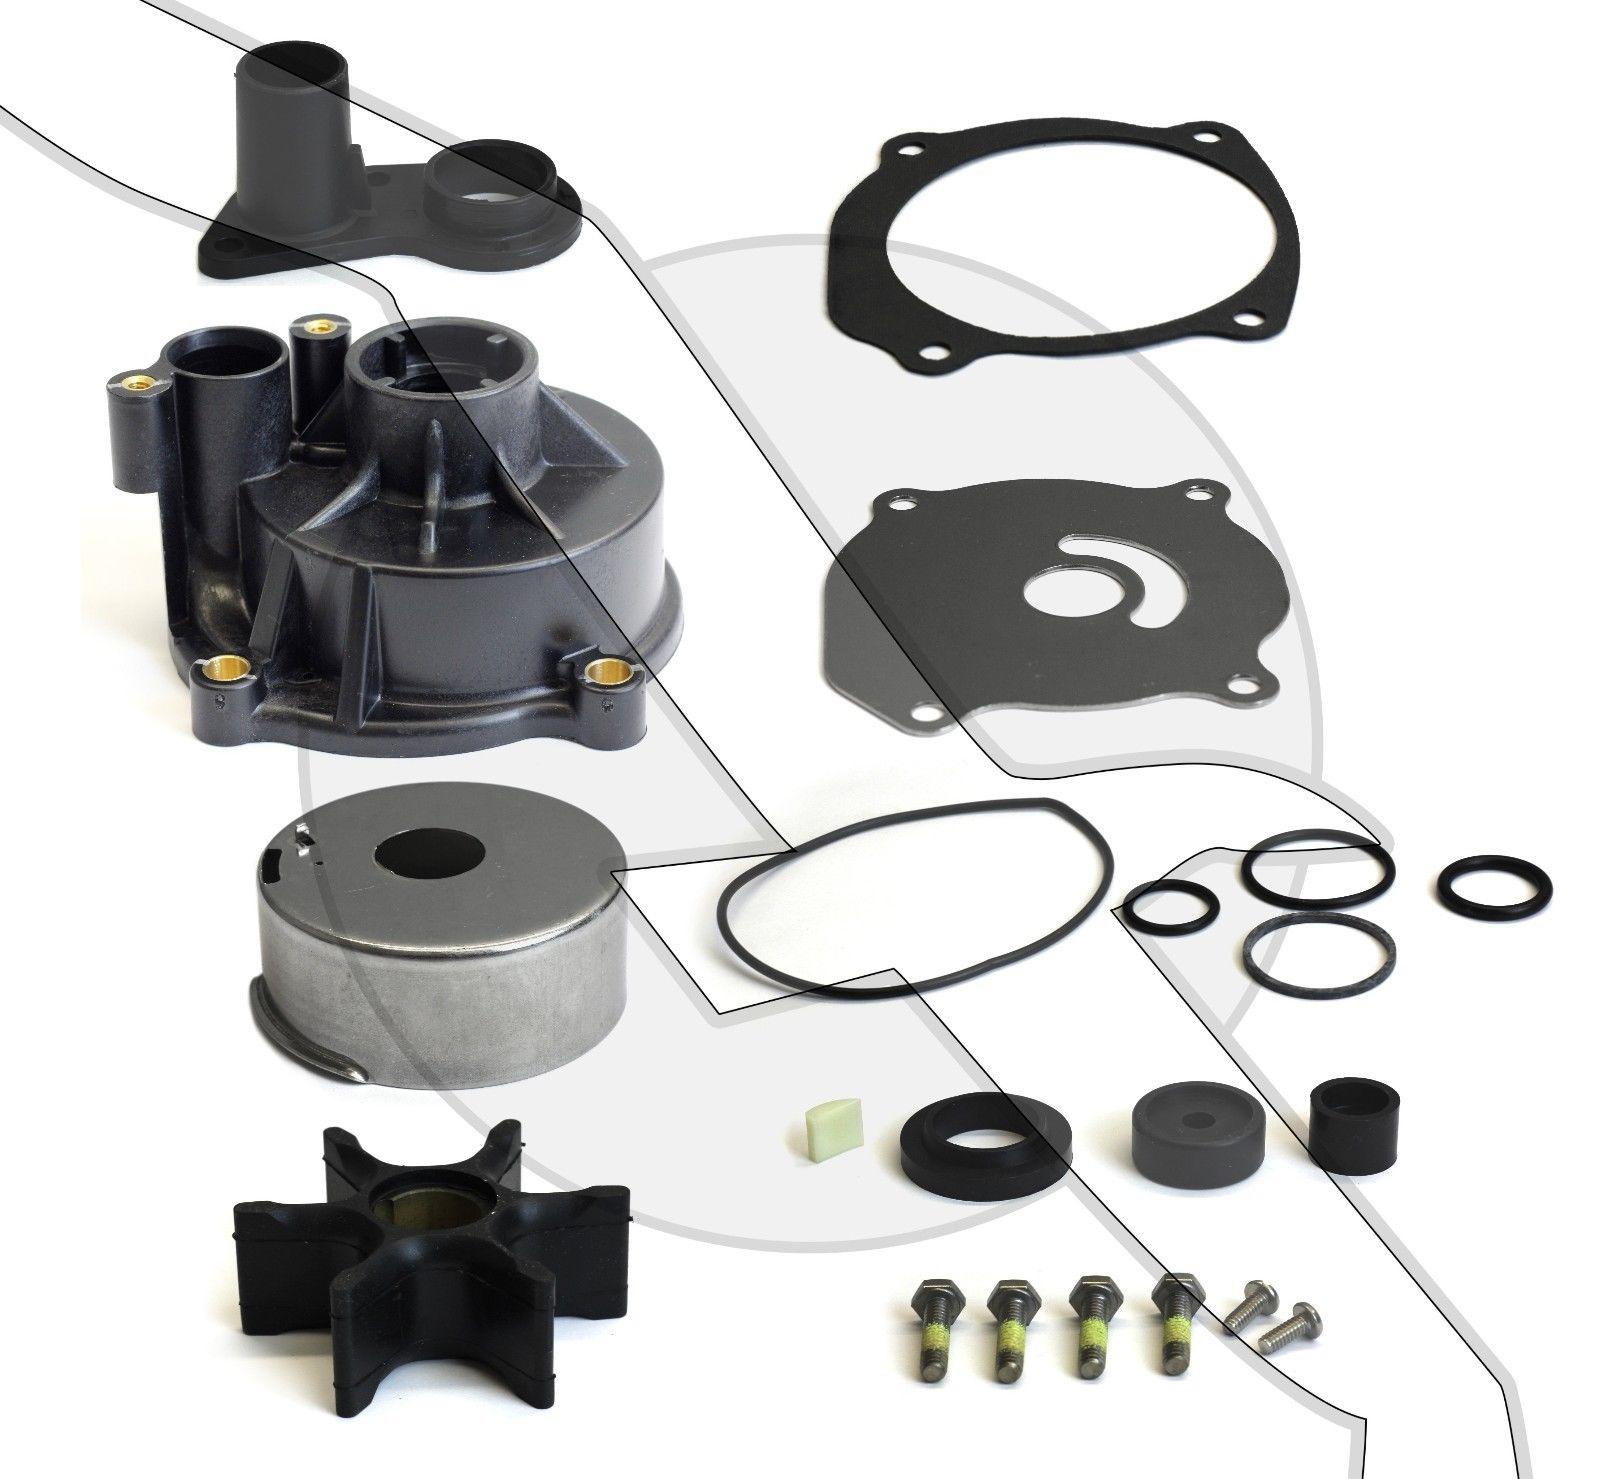 Water pump impeller repair rebuild kit for 85 300 hp for Winterizing yamaha 300 outboard